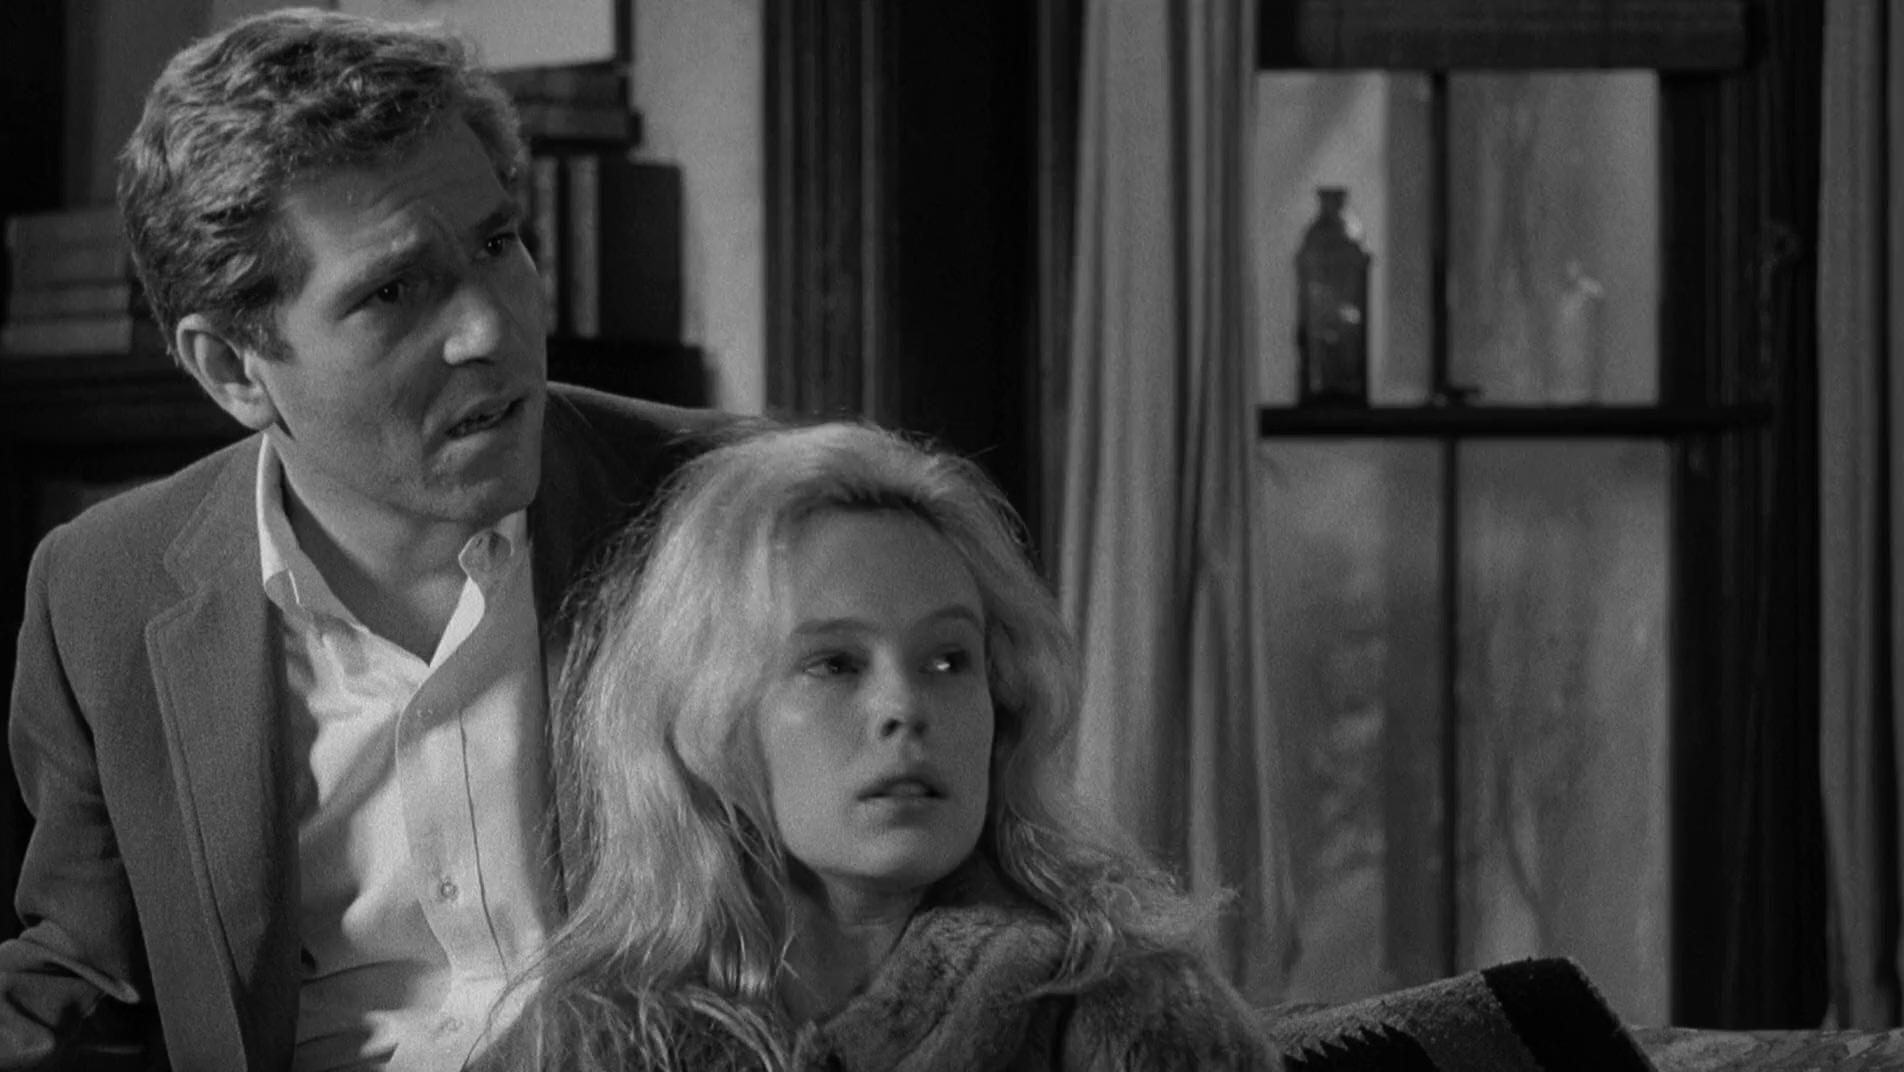 George Segal and Sandy Dennis in Who's Afraid of Virginia Woolf? (1966)